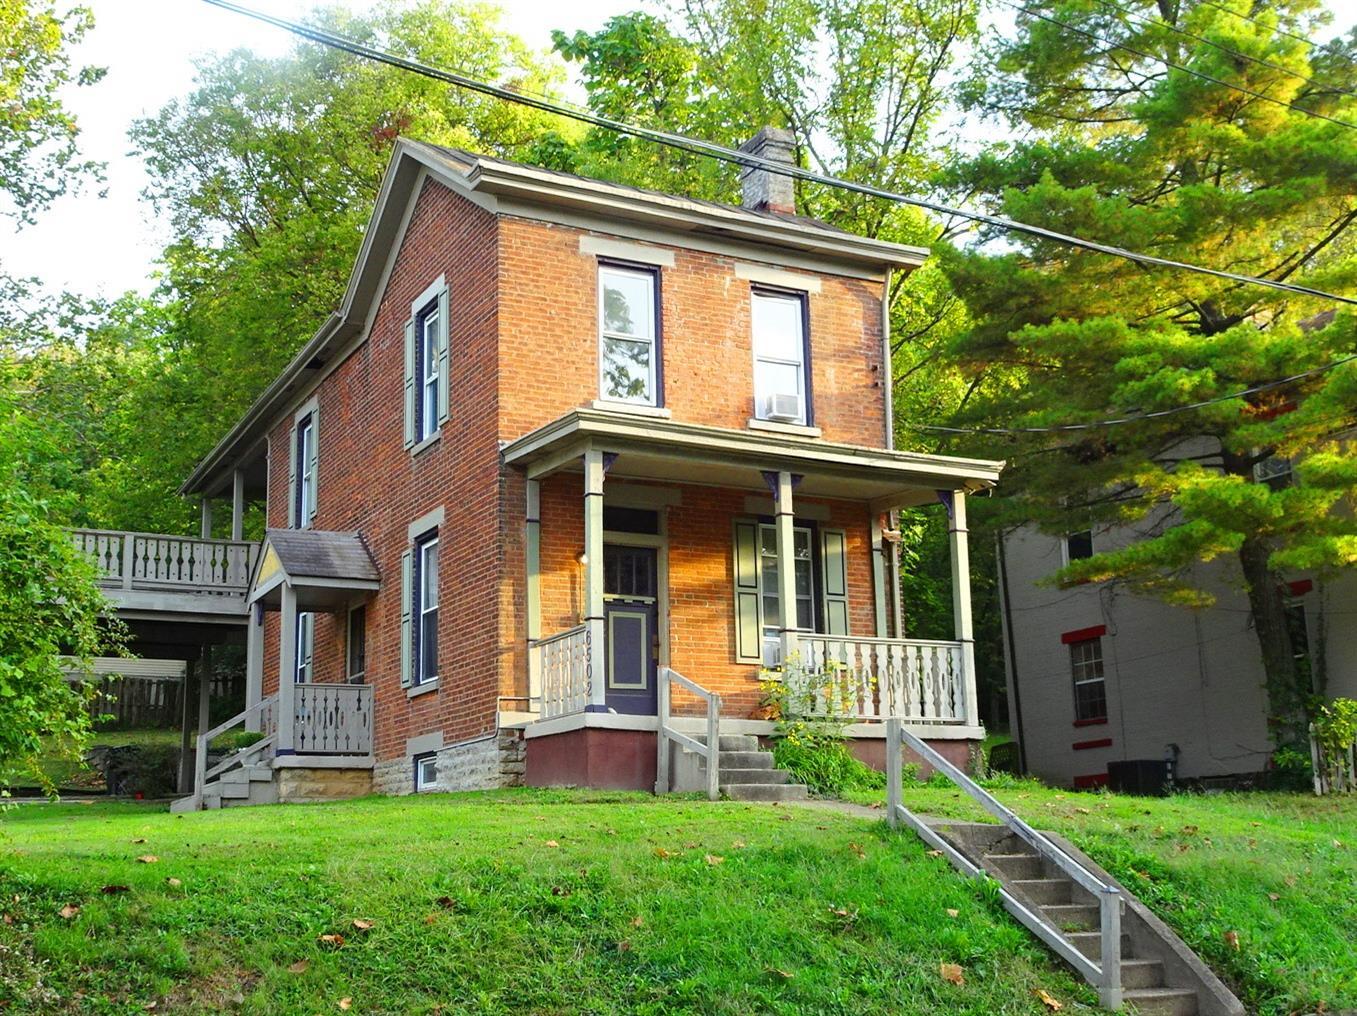 6502 Desmond Street, Cincinnati, Ohio 45227, 2 Bedrooms Bedrooms, 5 Rooms Rooms,1 BathroomBathrooms,Single Family Residence,For Sale,Desmond,1718735